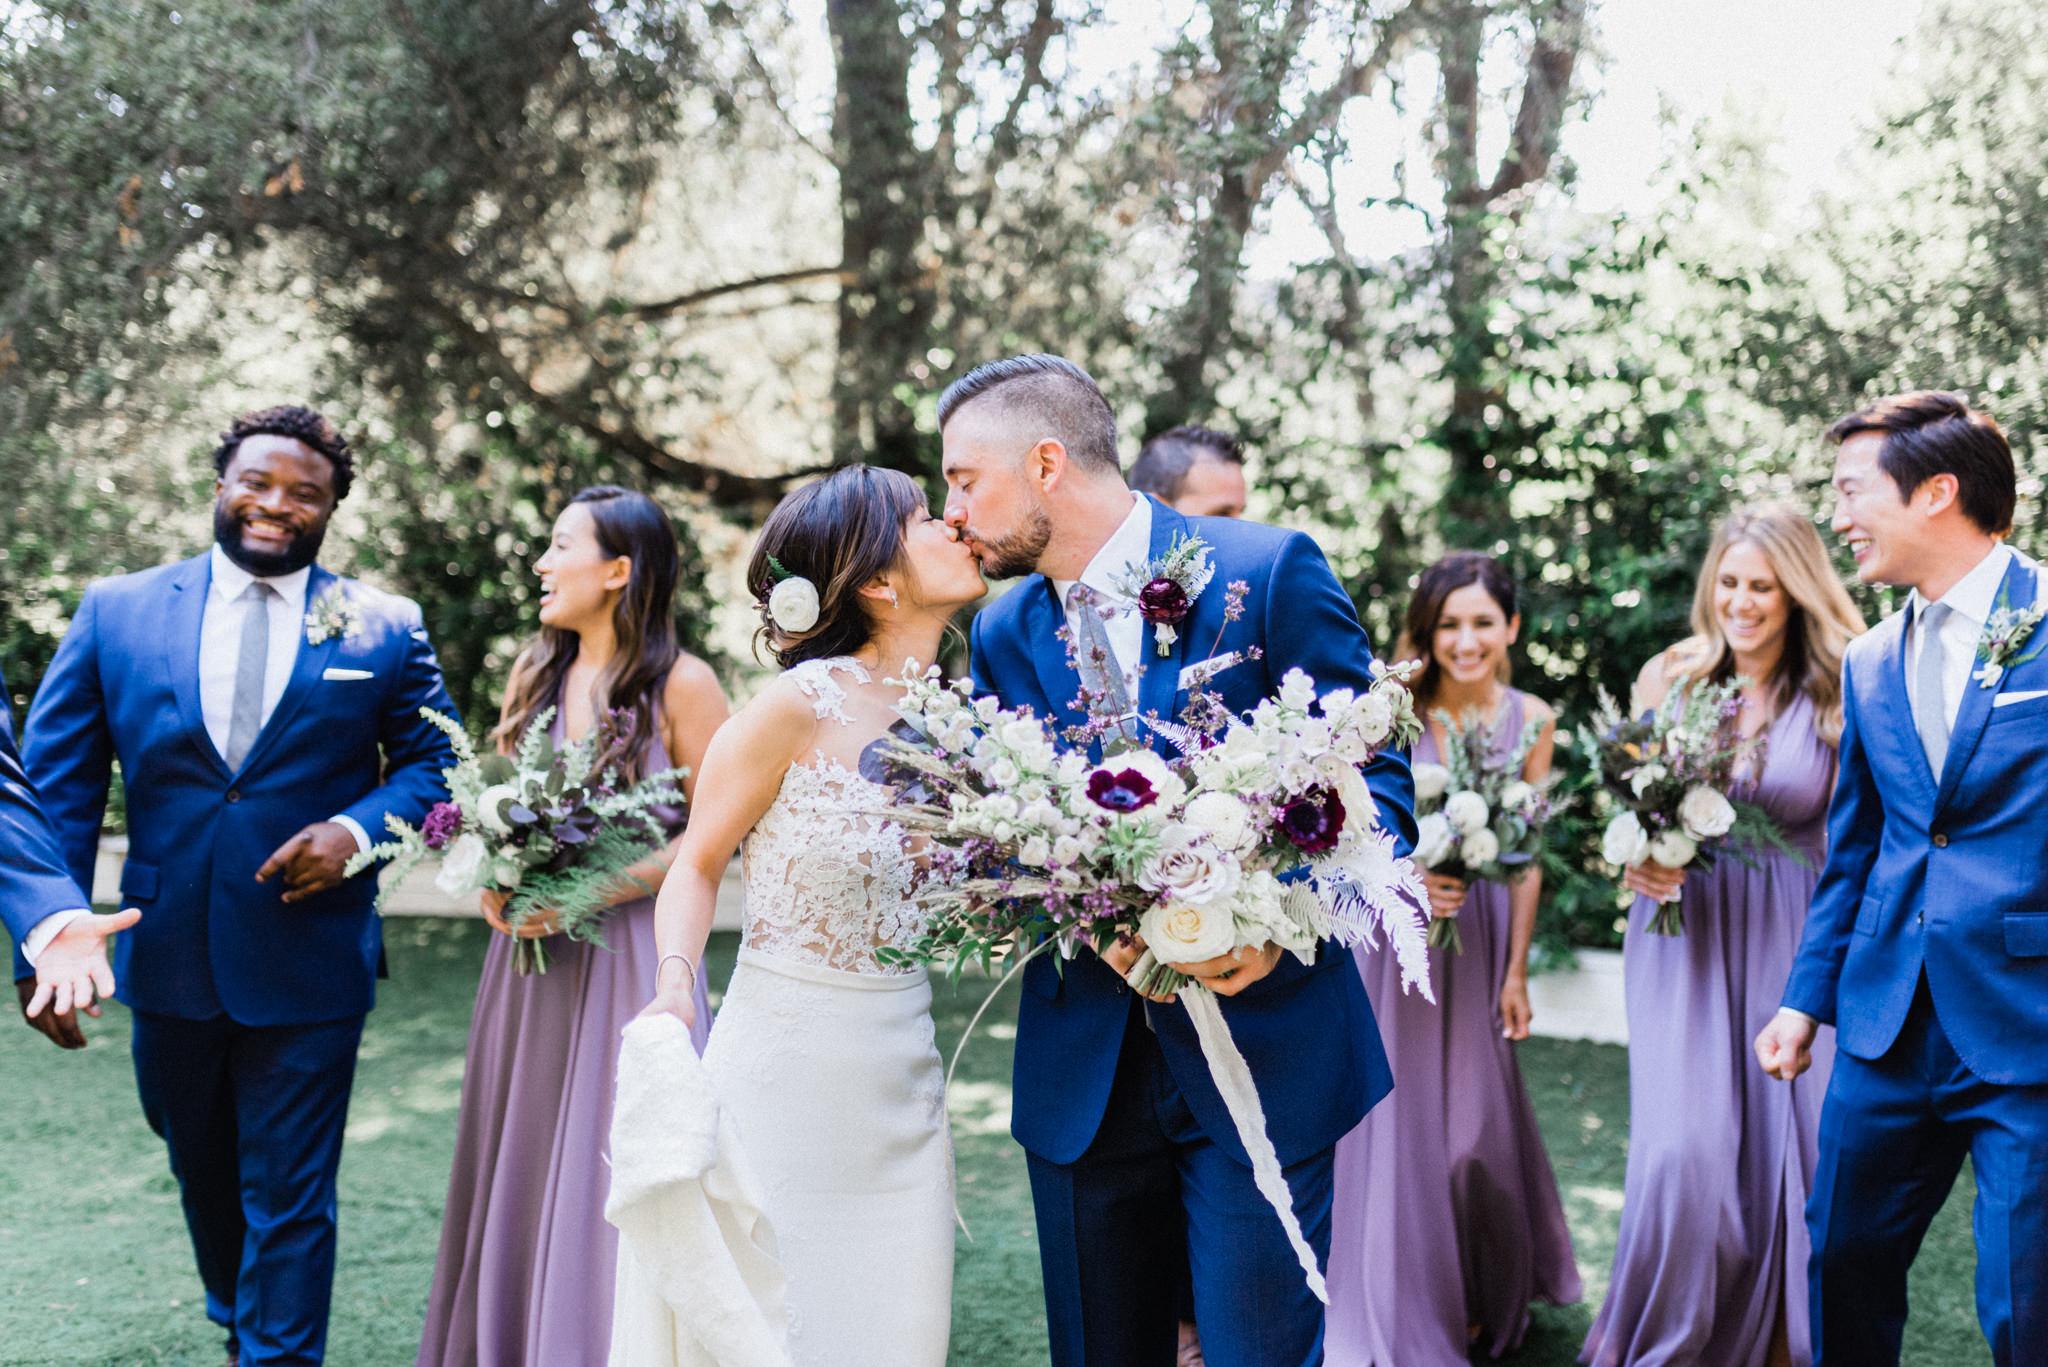 Calamigos-Ranch-Malibu-Wedding-Photographer-78.jpg